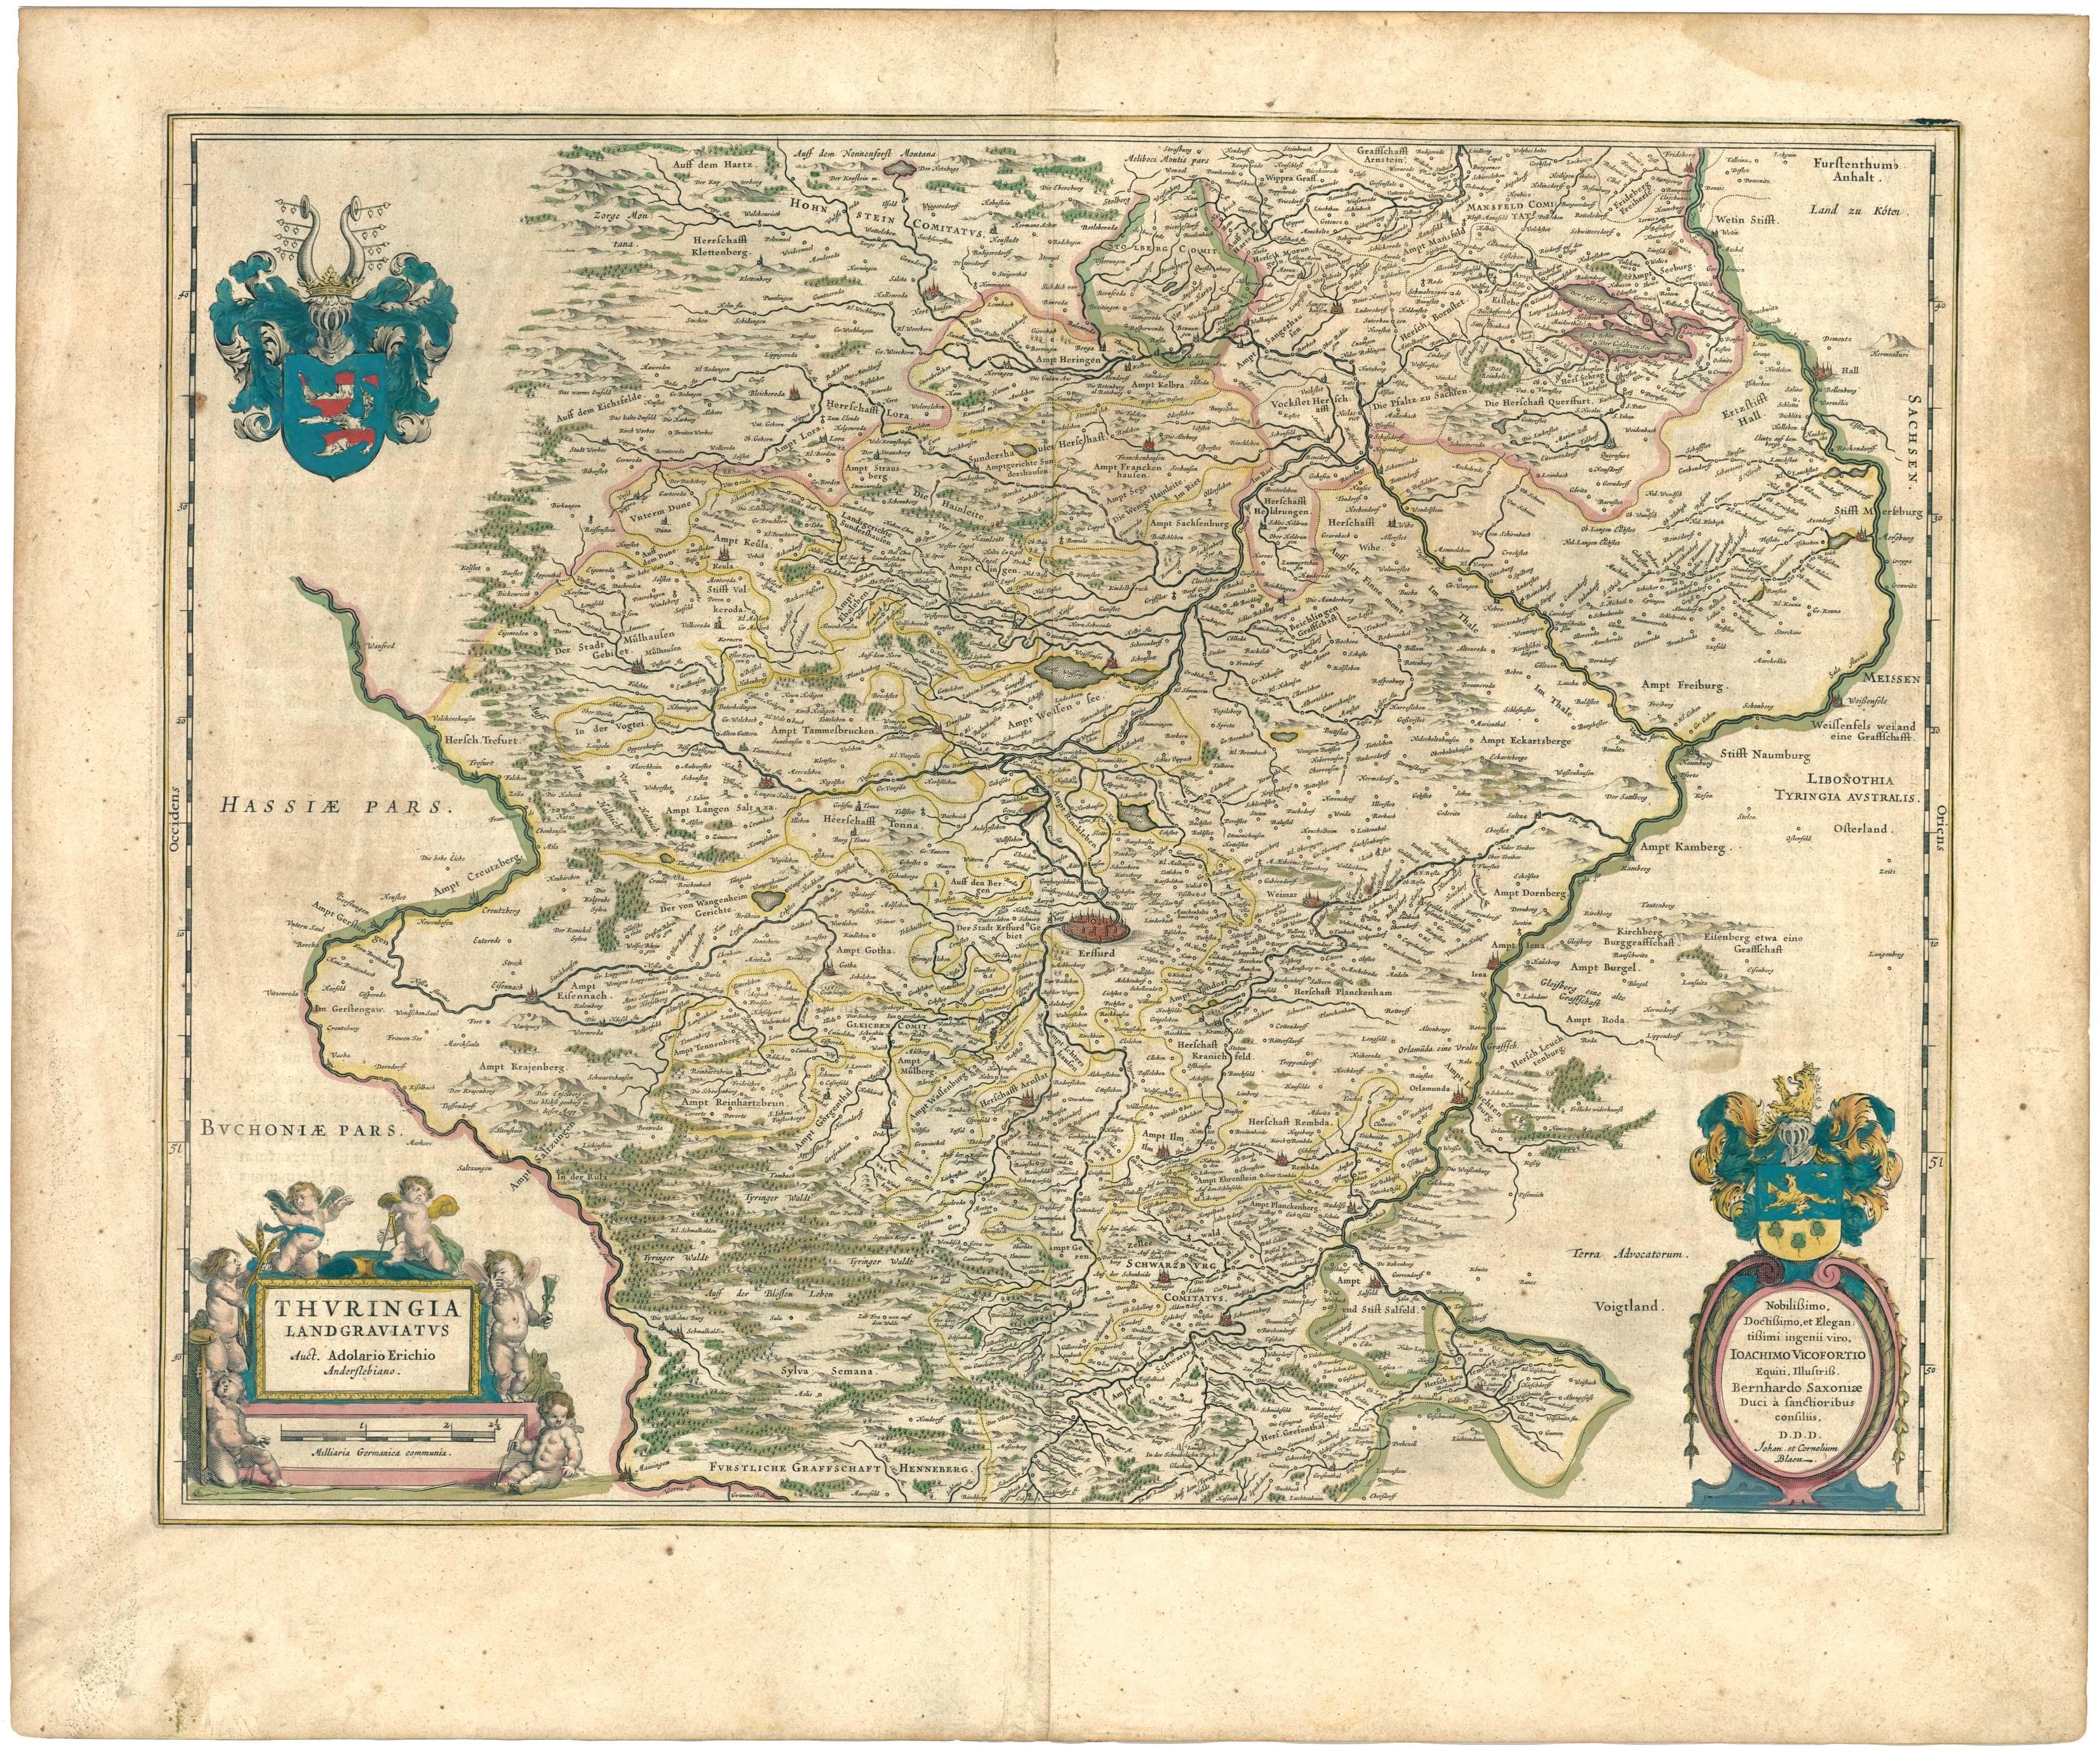 Landgraviate of Thuringia 1645